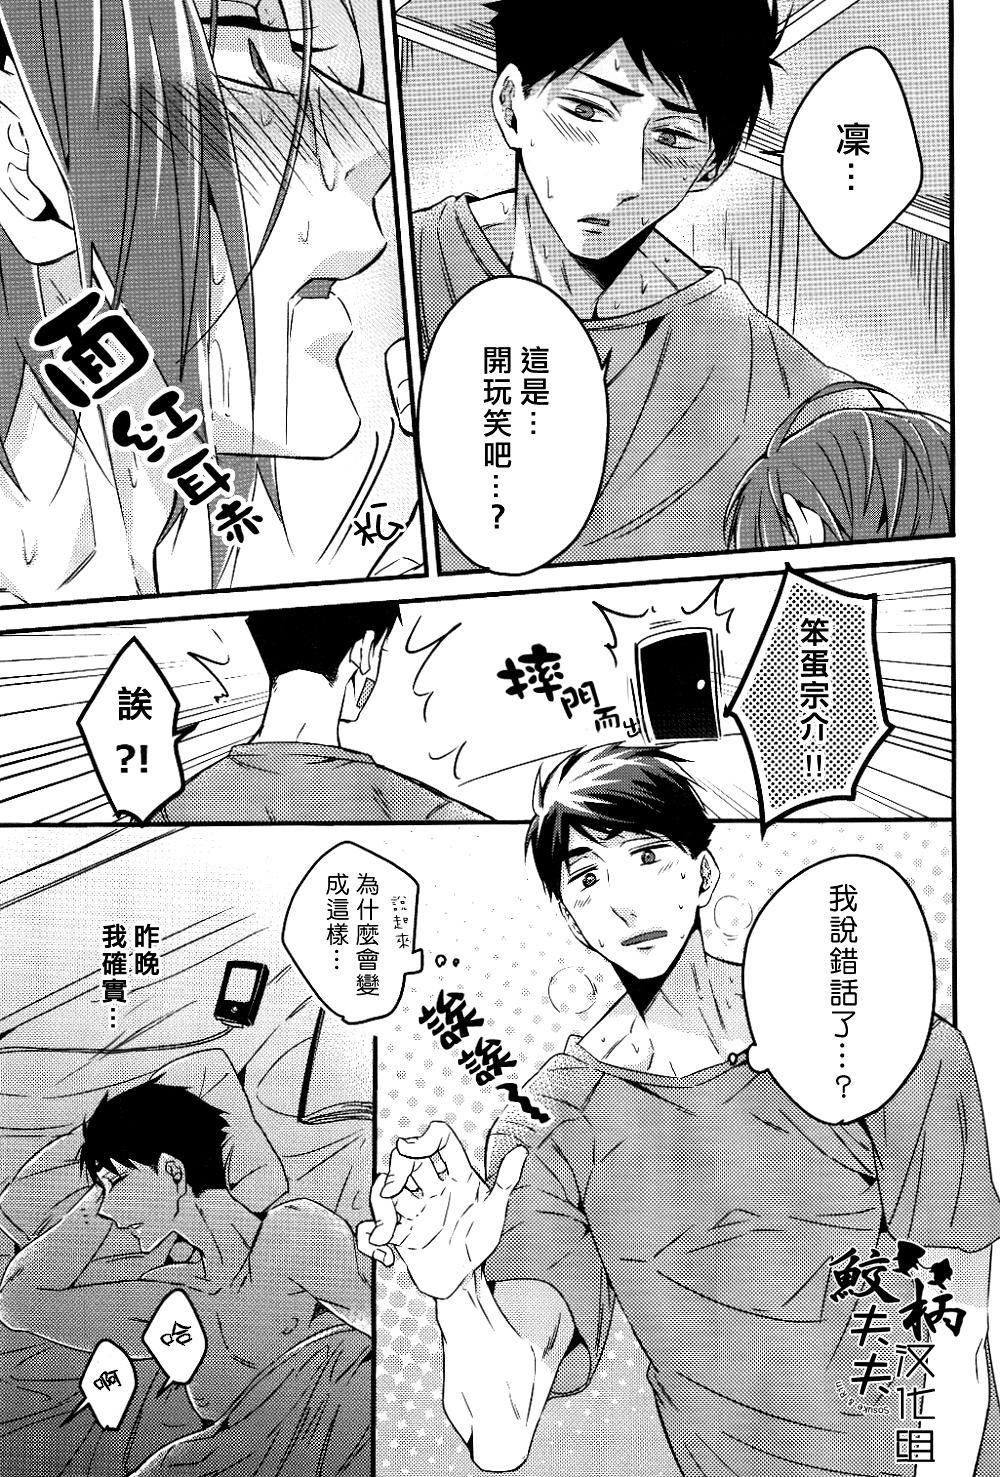 Gomen daisukida! 5